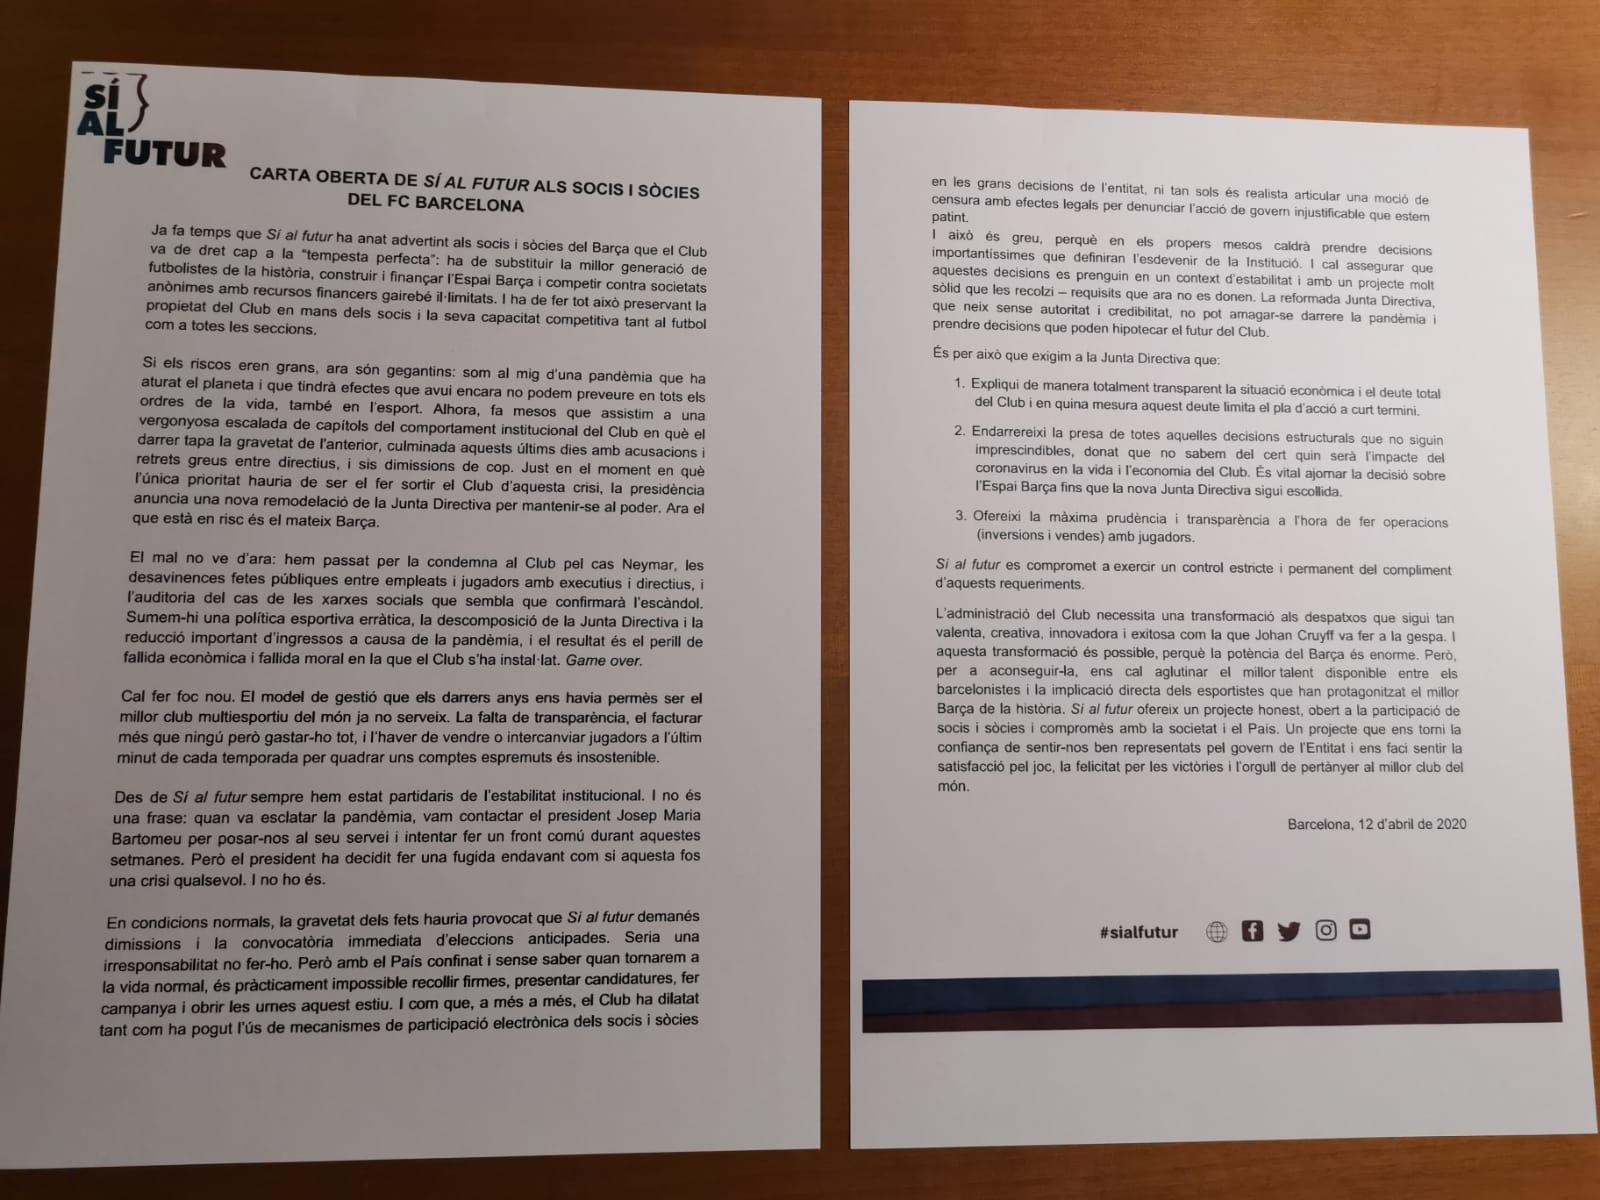 Sí al futur's open letter to all FC Barcelona members